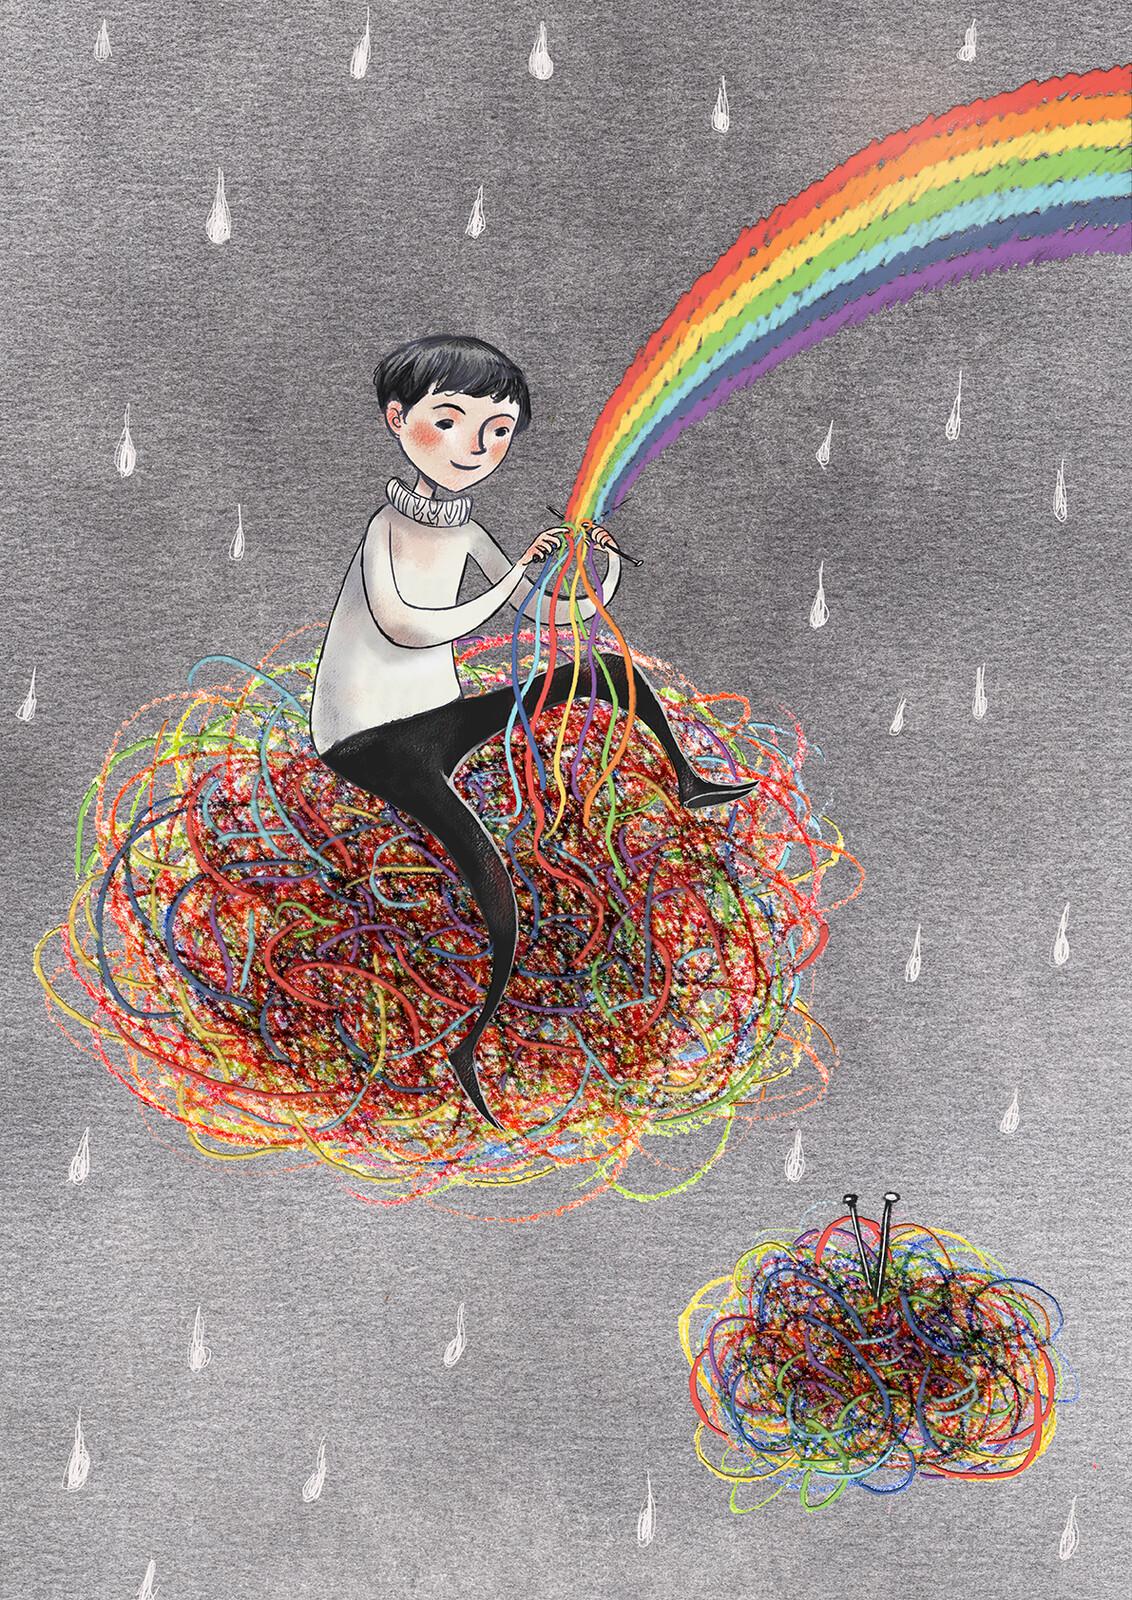 Groviglio arcobaleno